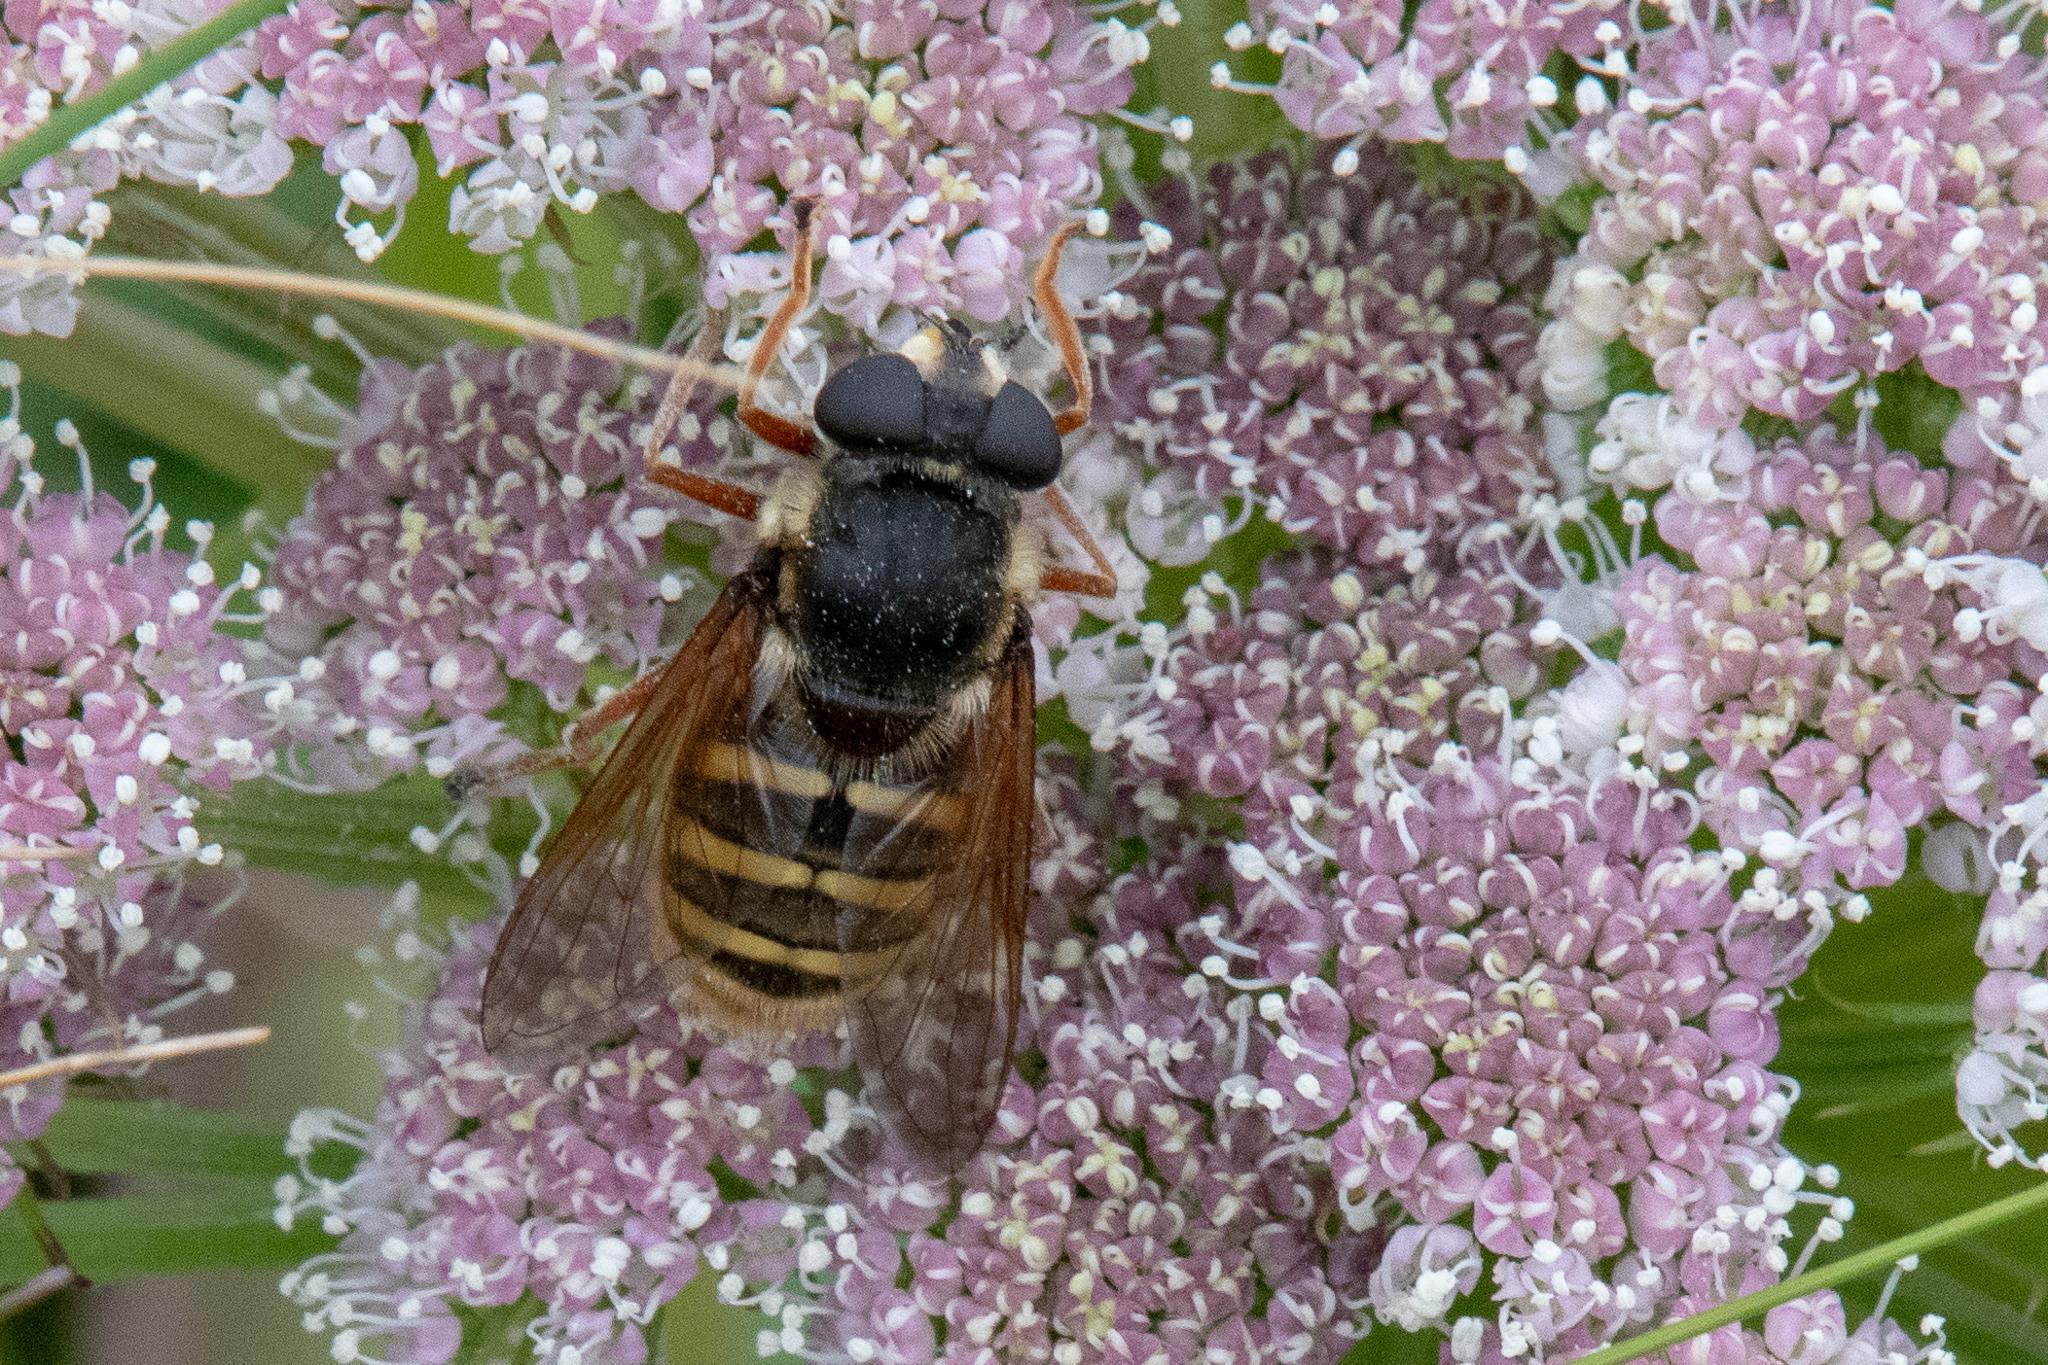 Sericomyia silentis - Hoverfly - photograph (c) David Bailey (not the)